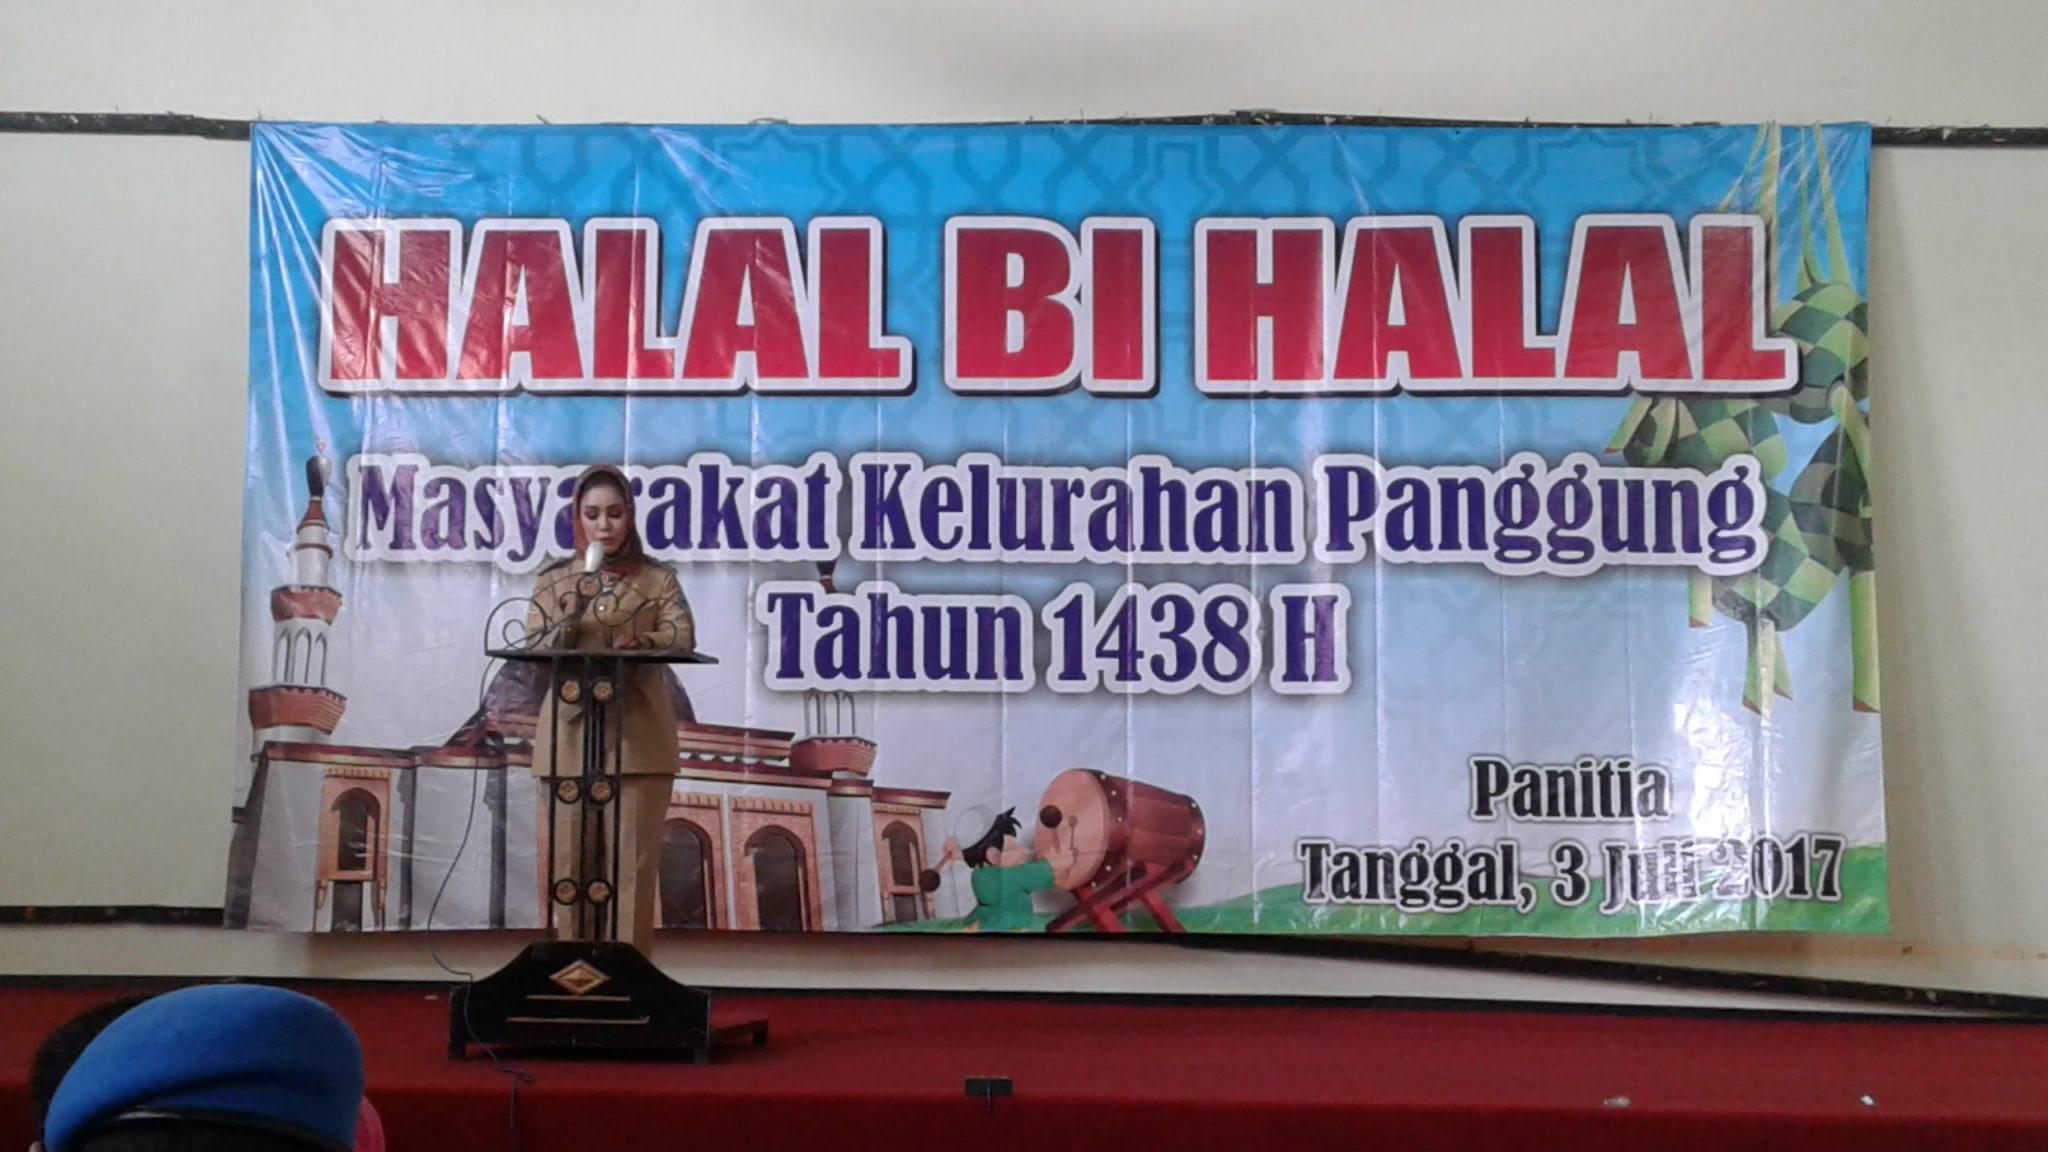 Wali Kota Idul Fitri Momen Saling Memaafkan Http Wartabahari Com